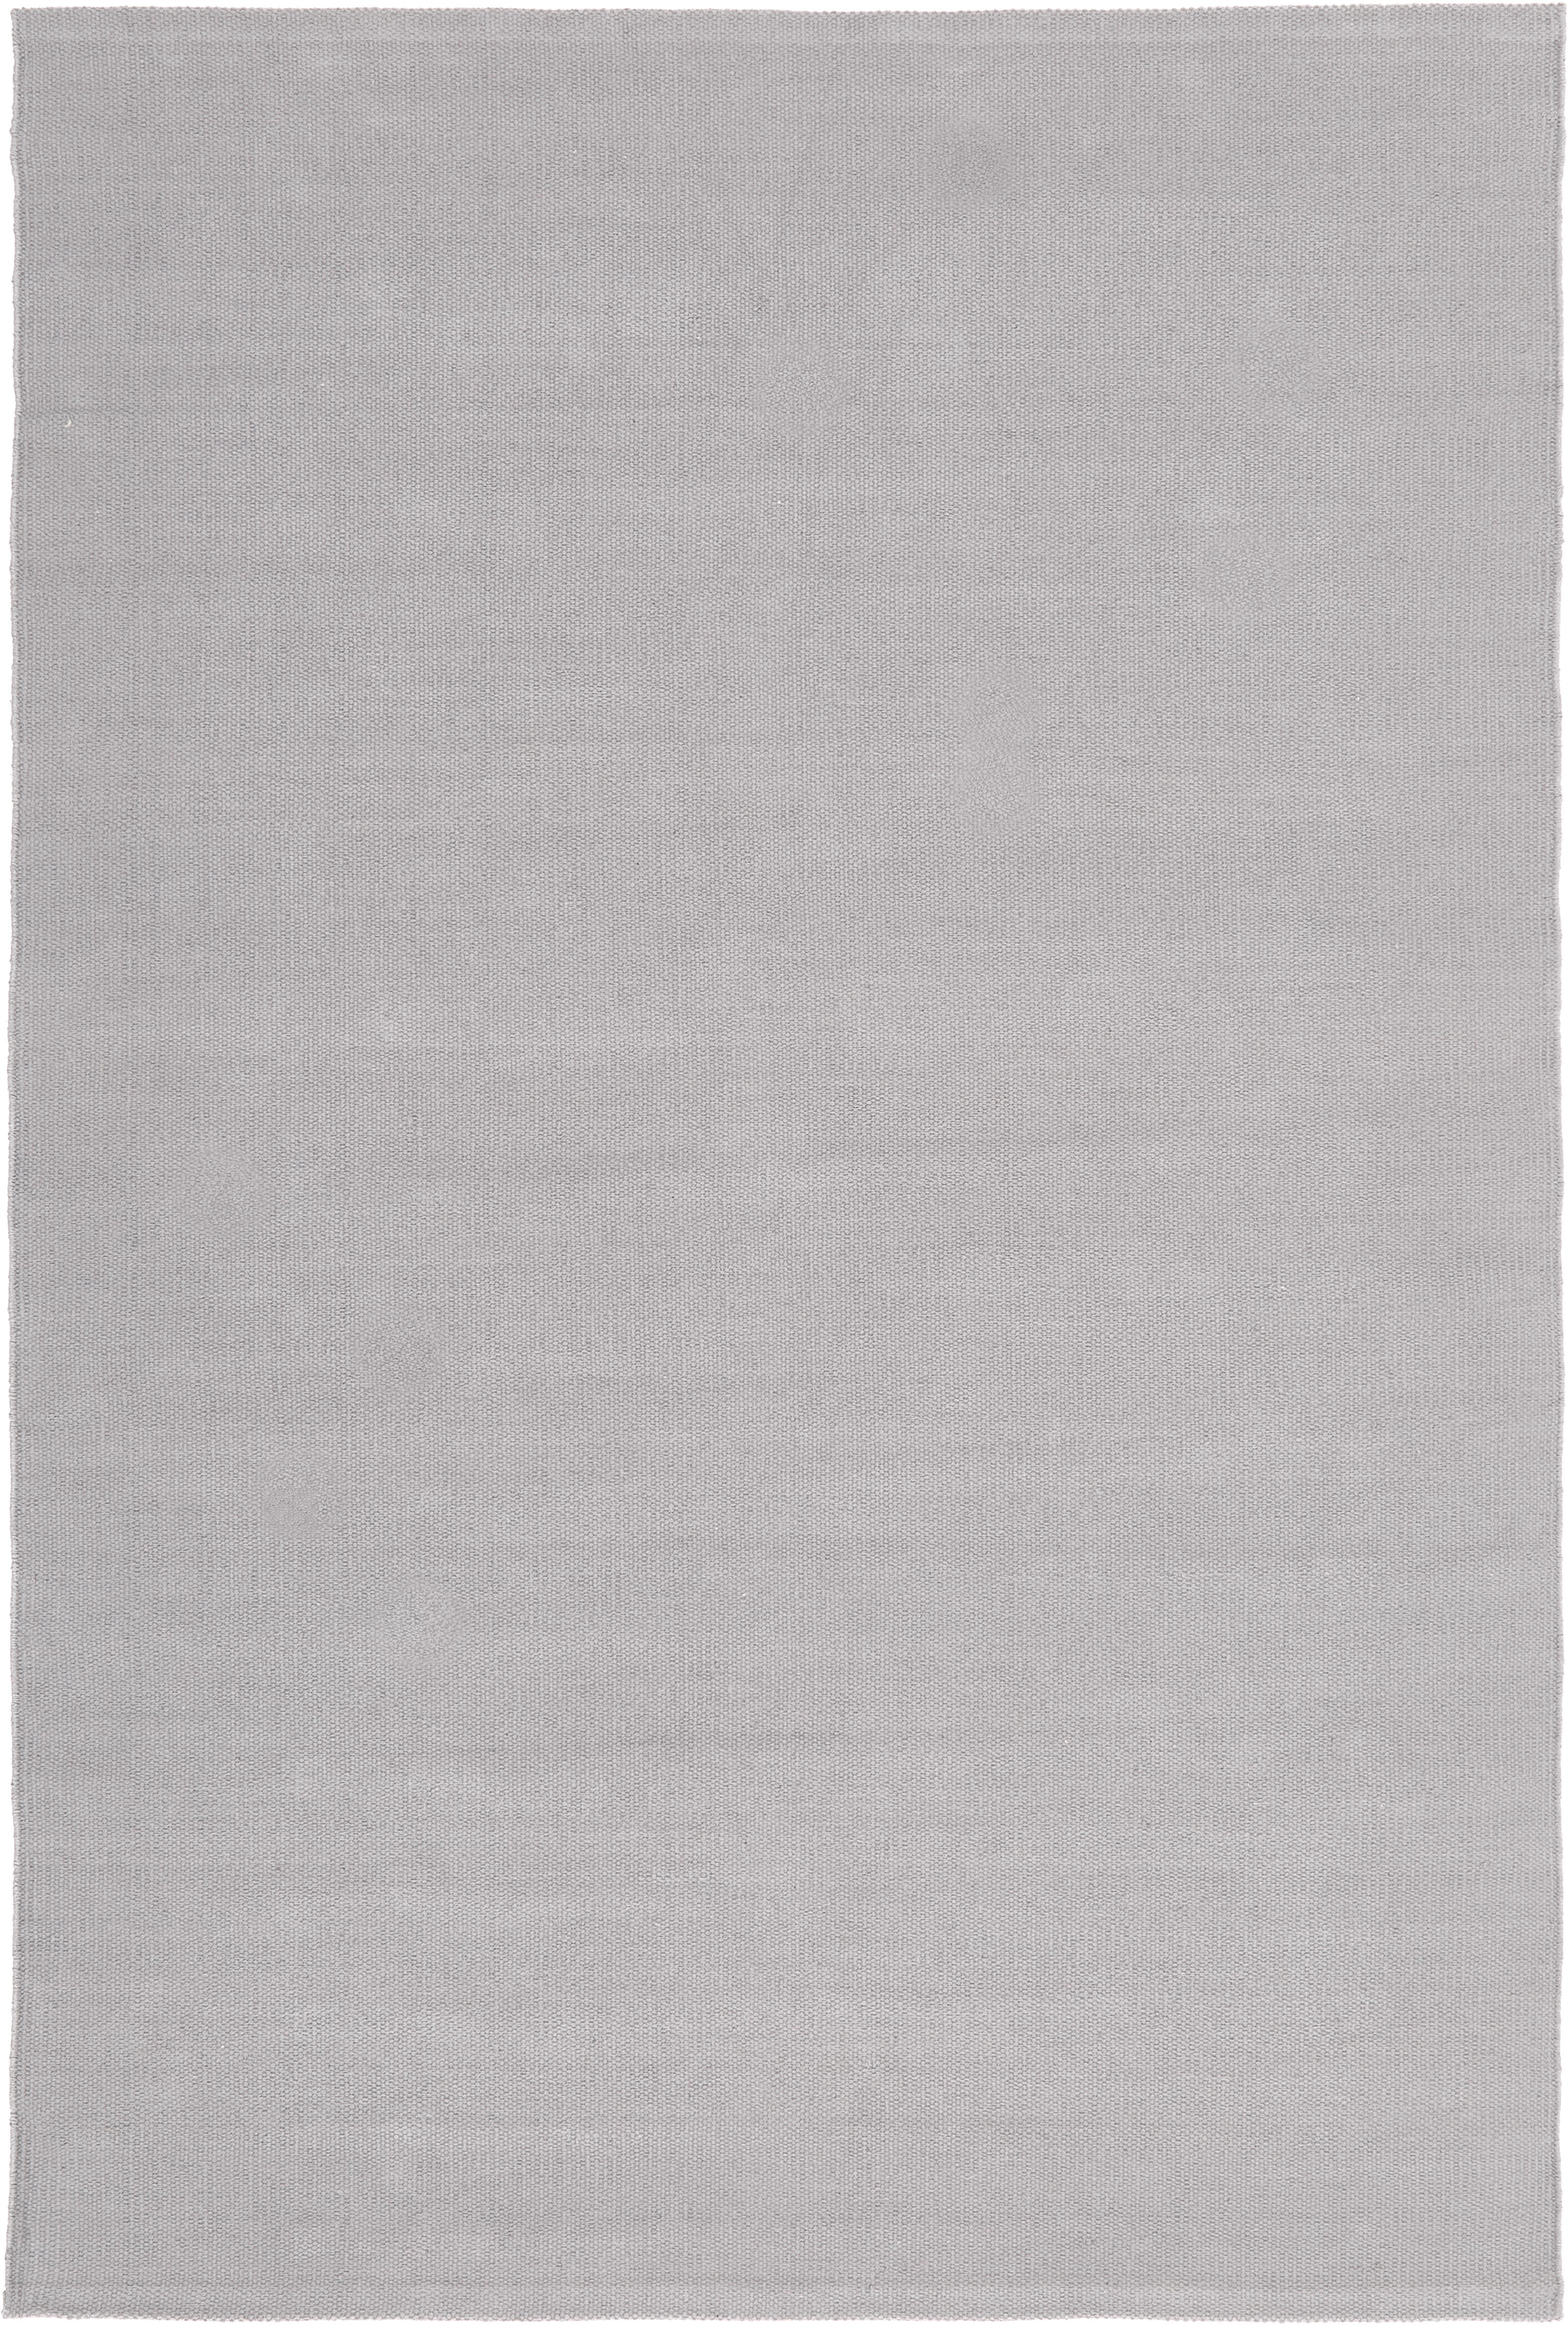 Alfombra artesanal de algodón Agneta, 100%algodón, Gris, An 200 x L 300  cm(Tamaño L)